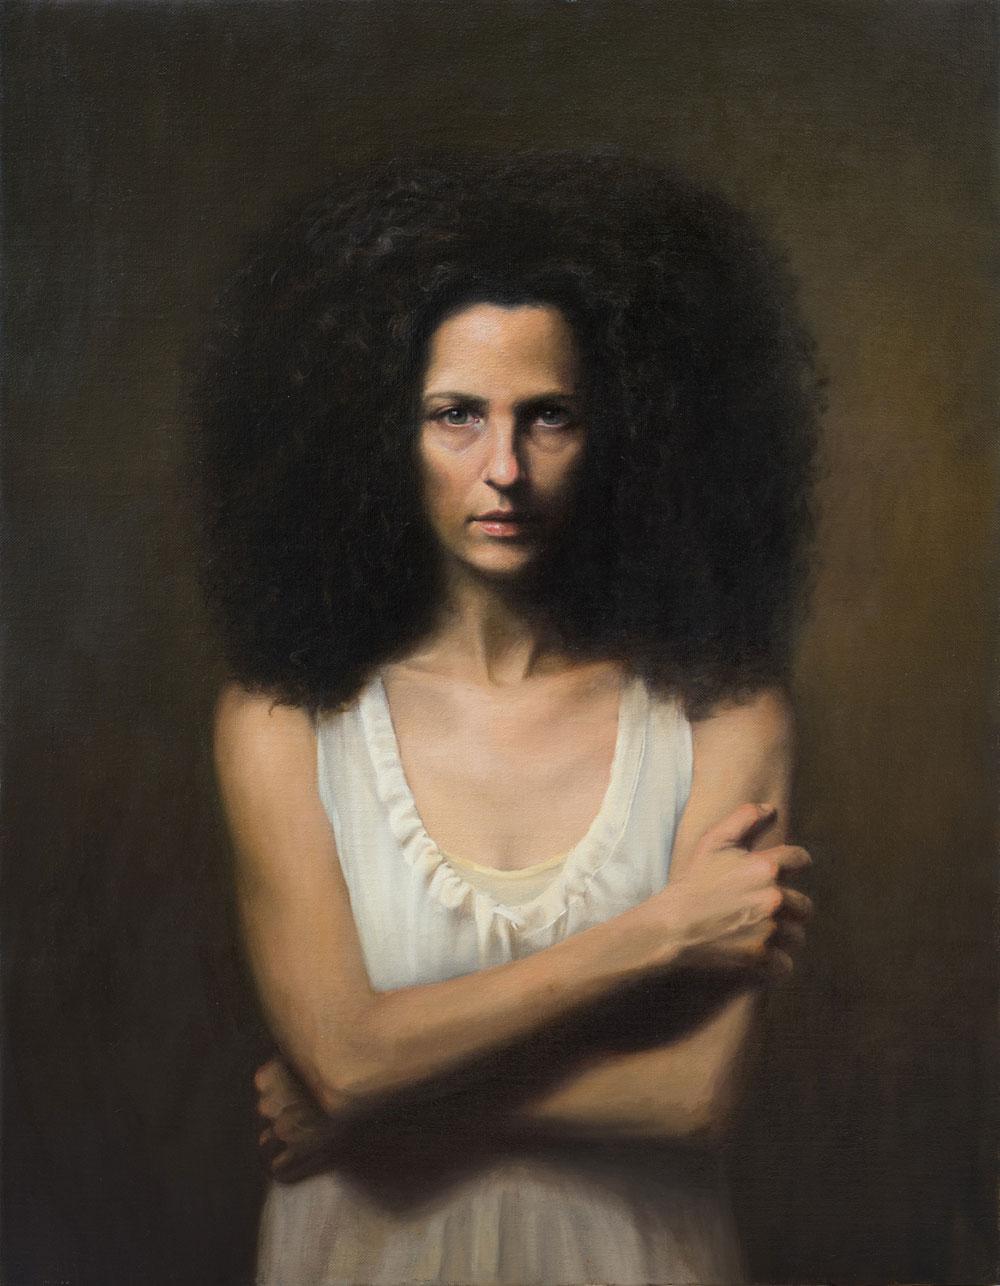 דנה זלצמן, דיוקן אישי, 2016